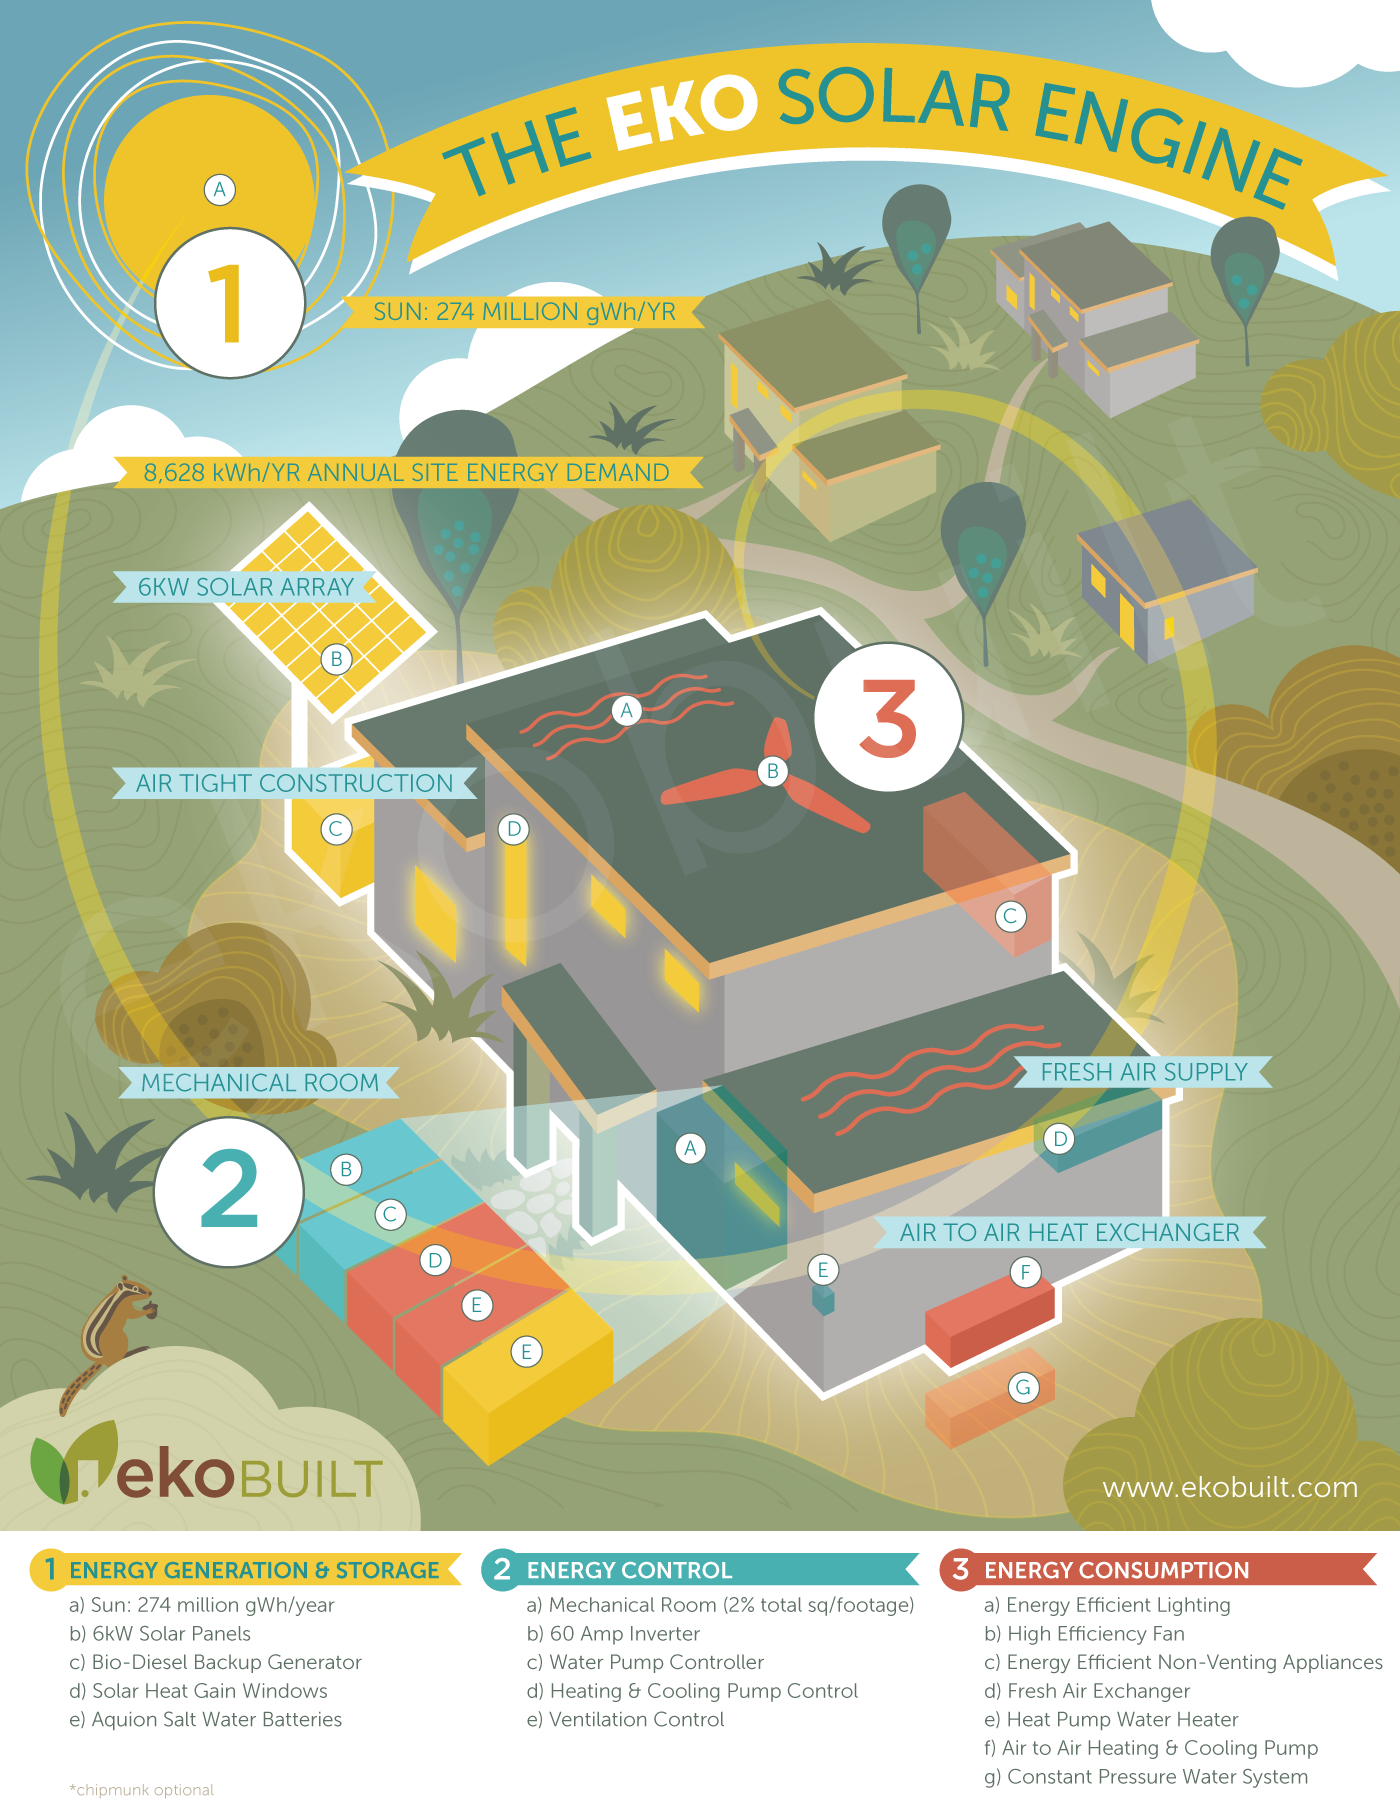 Eko Solar Engine Sumack Loft Diagram Ottawa Illustration